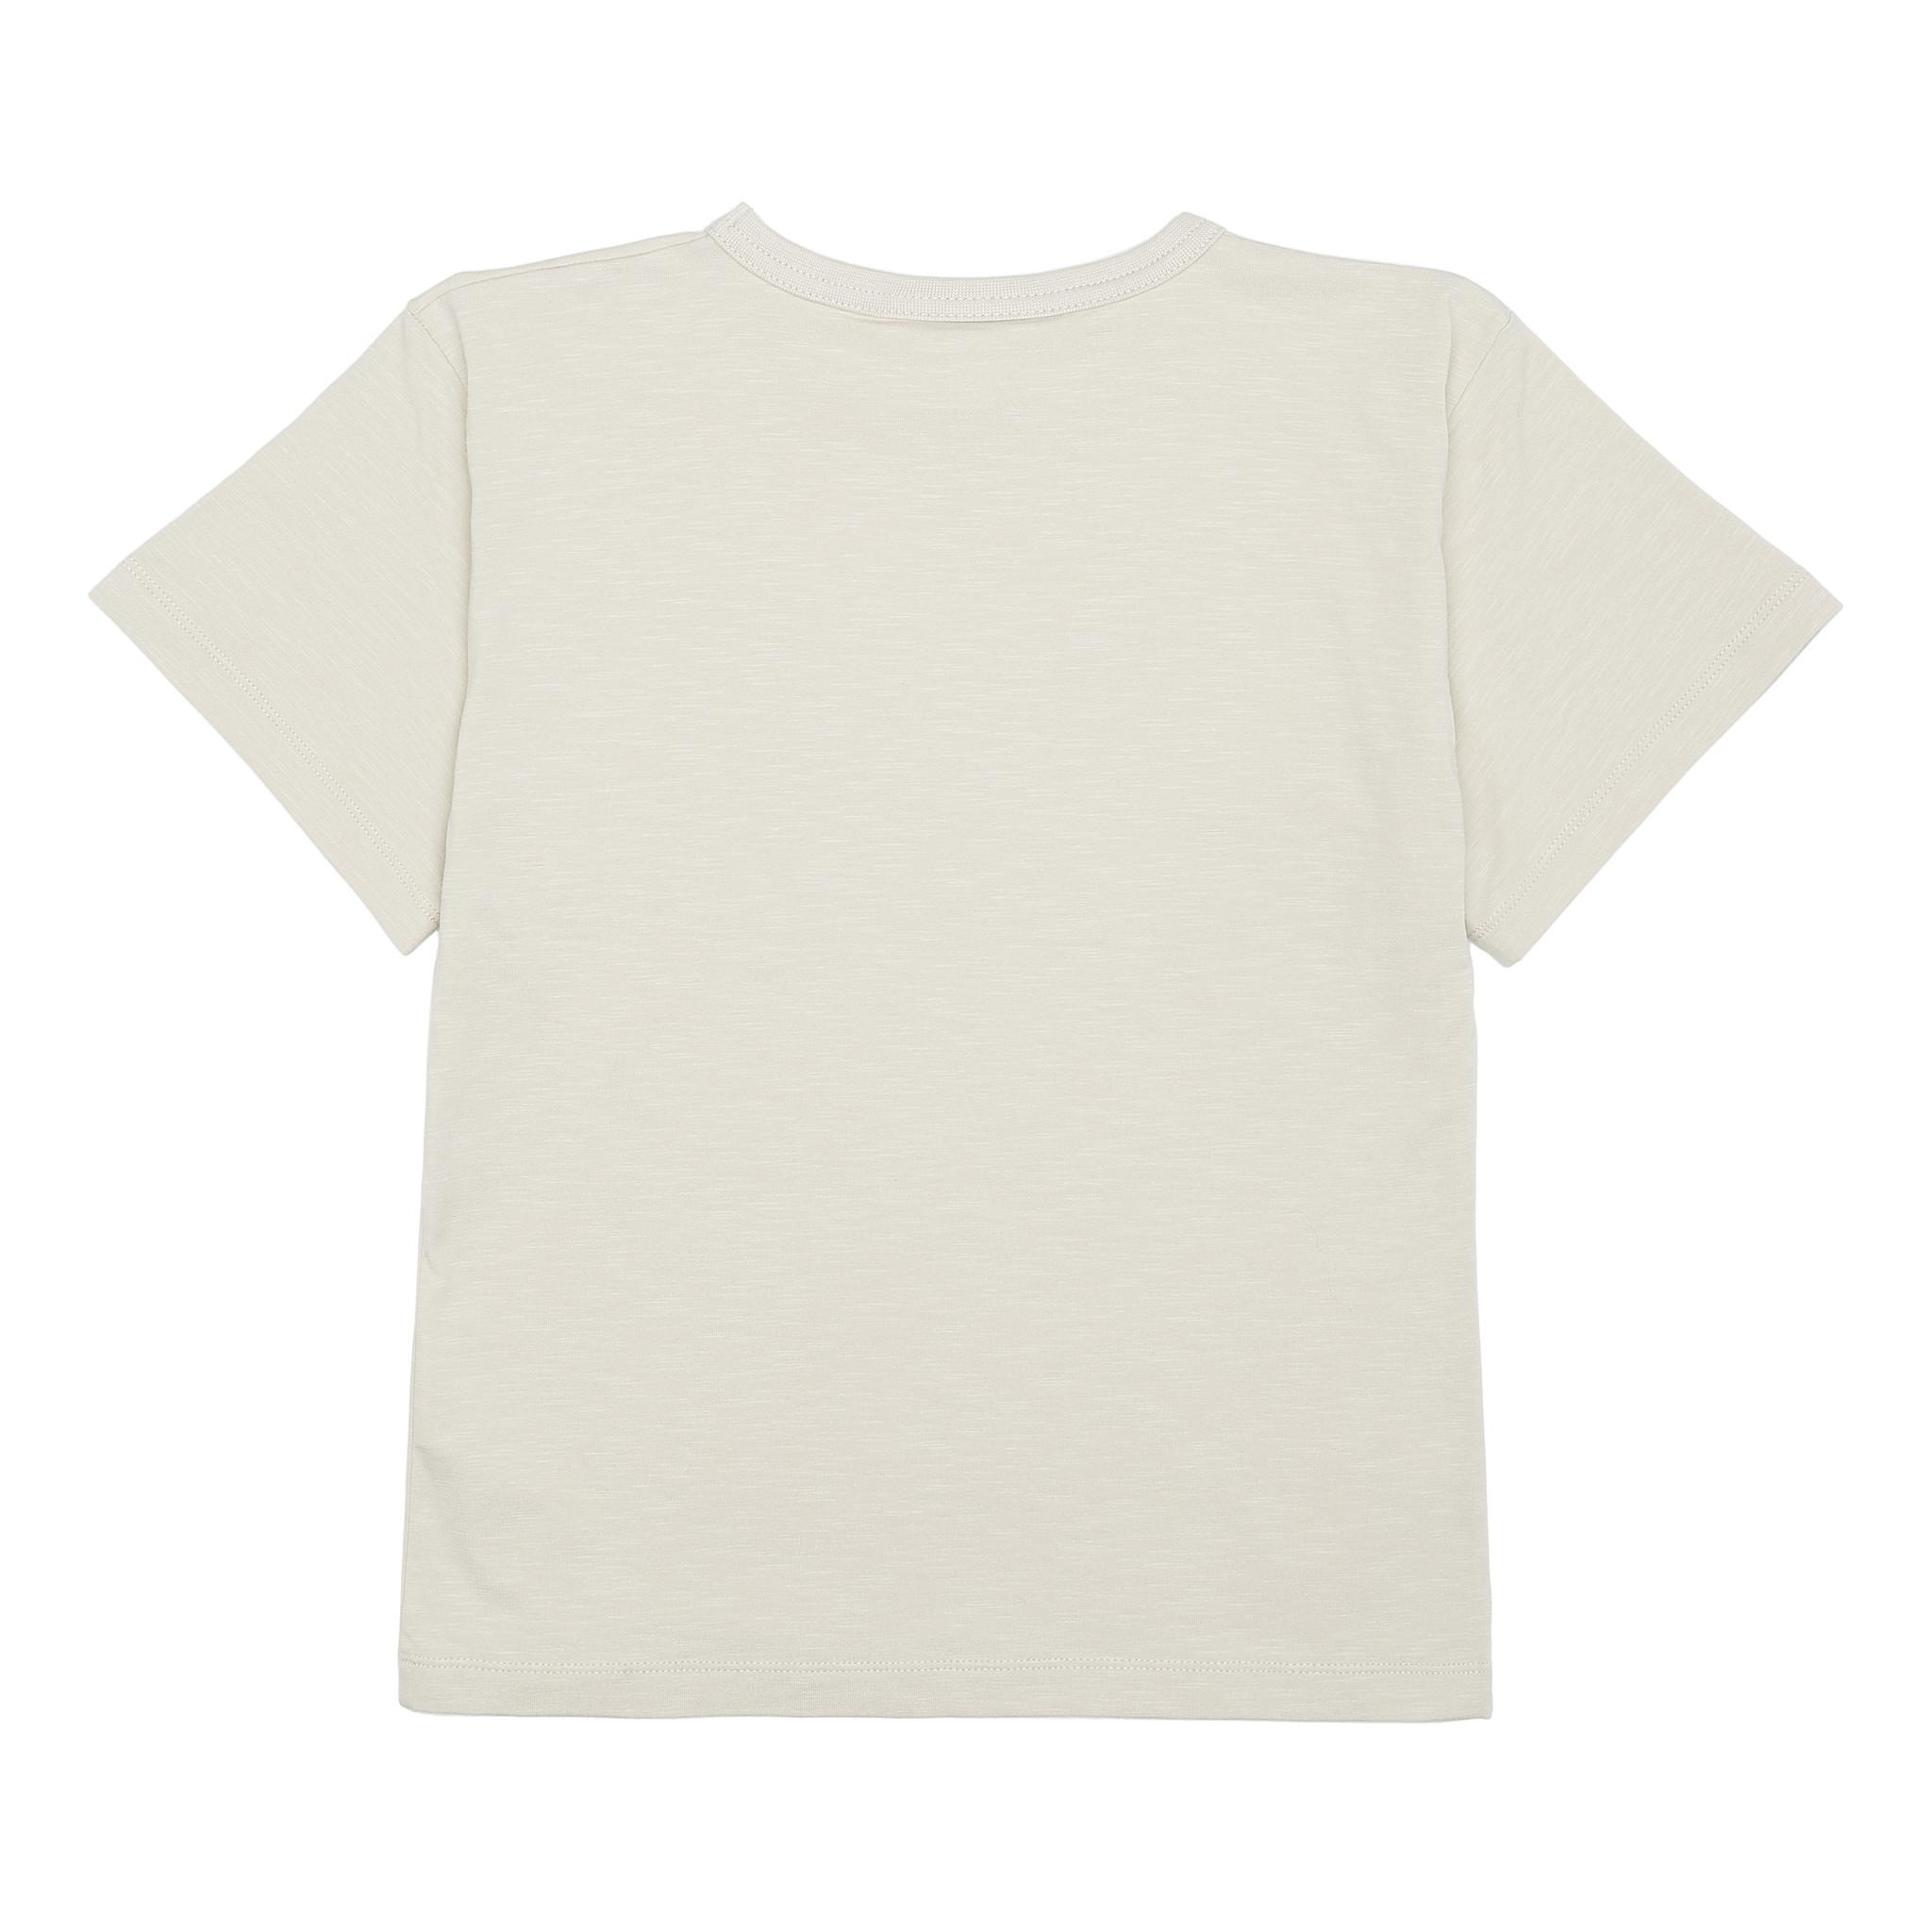 Asger T-shirt - Oyster Gray / Hancock-3